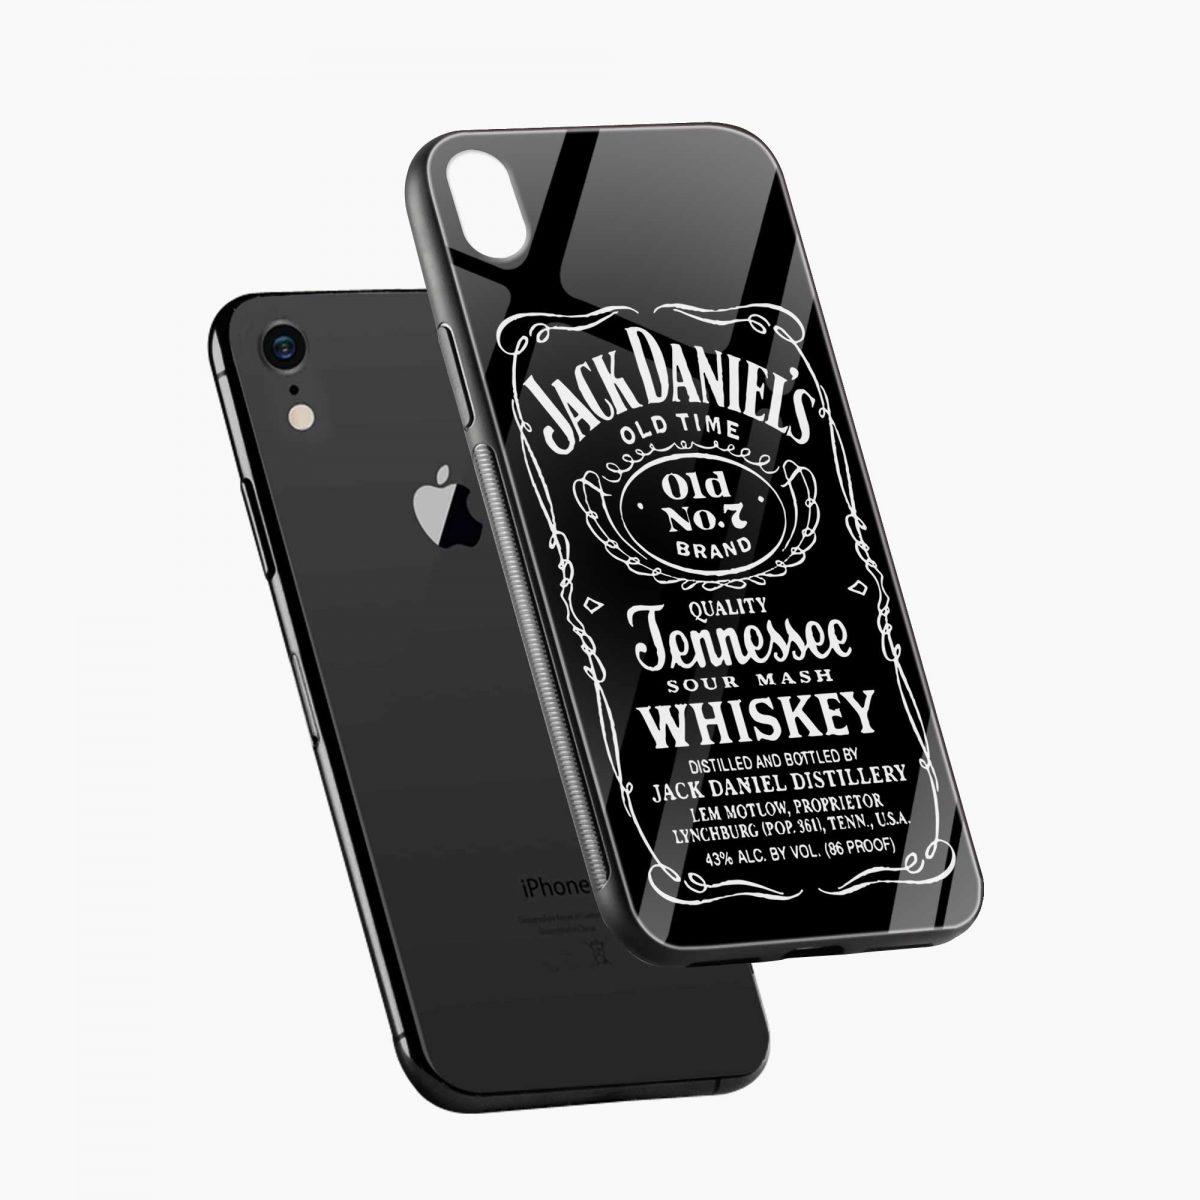 jack daniels whiskey apple iphone xr back cover diagonal view